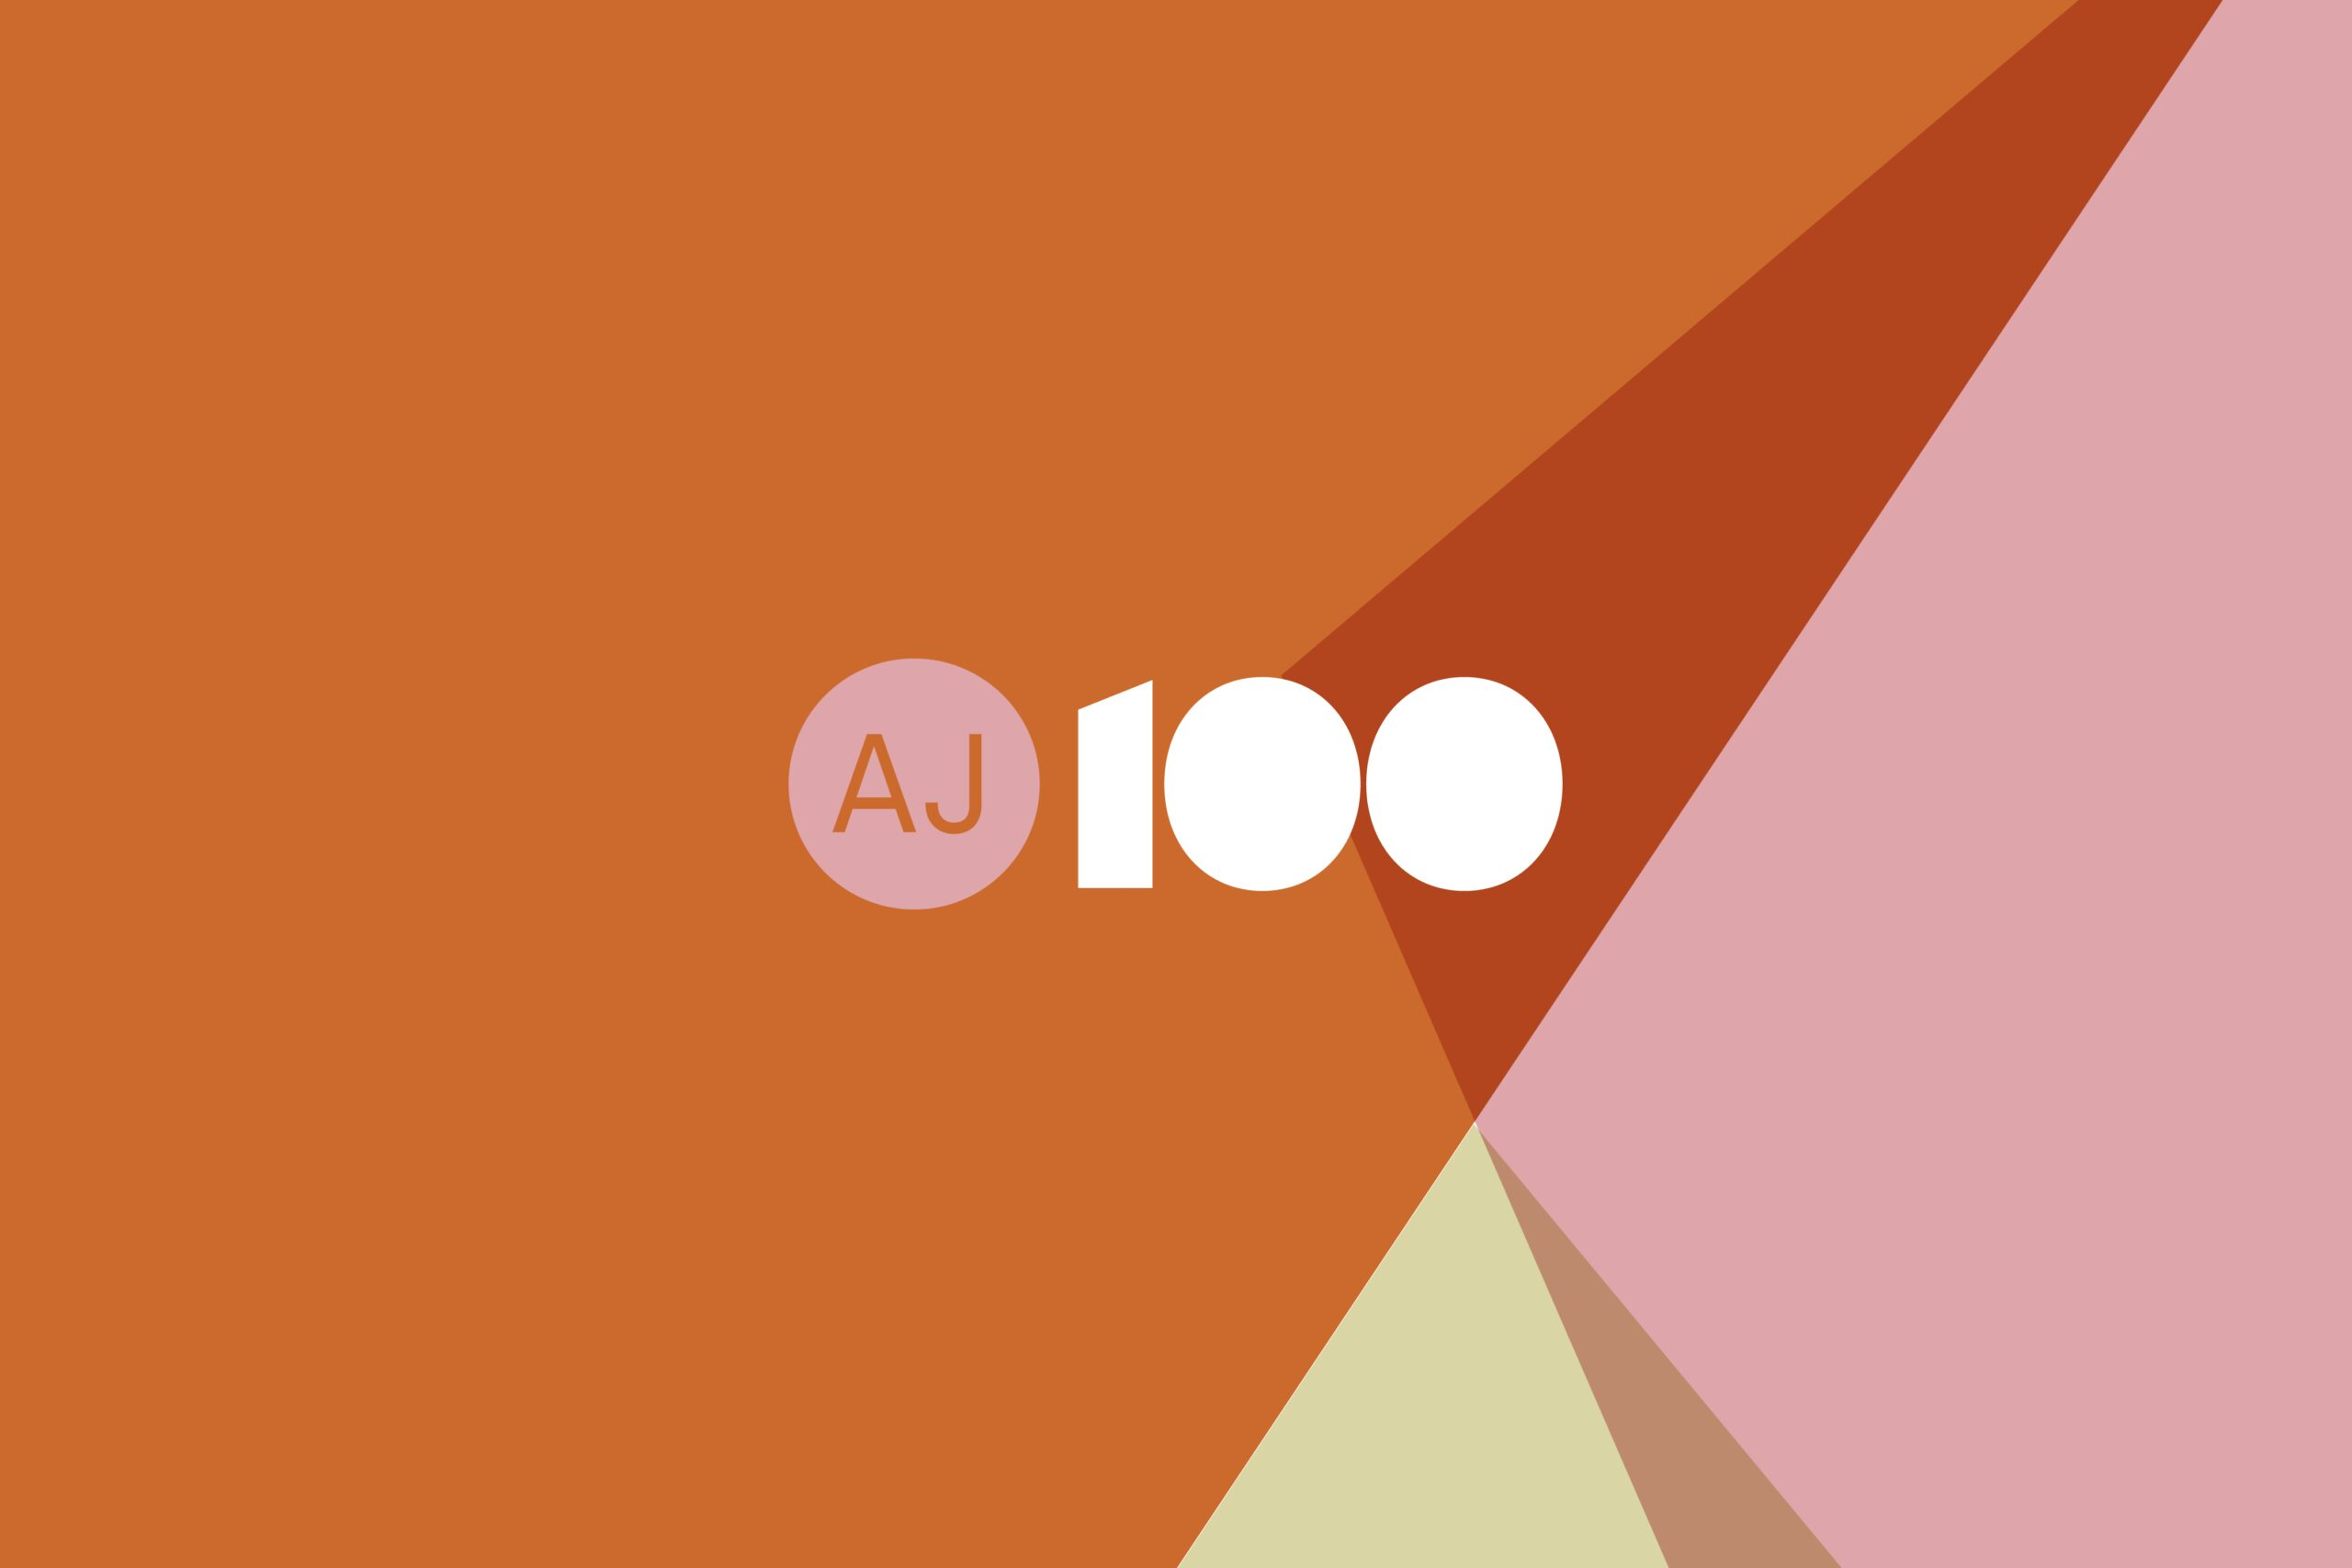 AJ100 logo for 2020